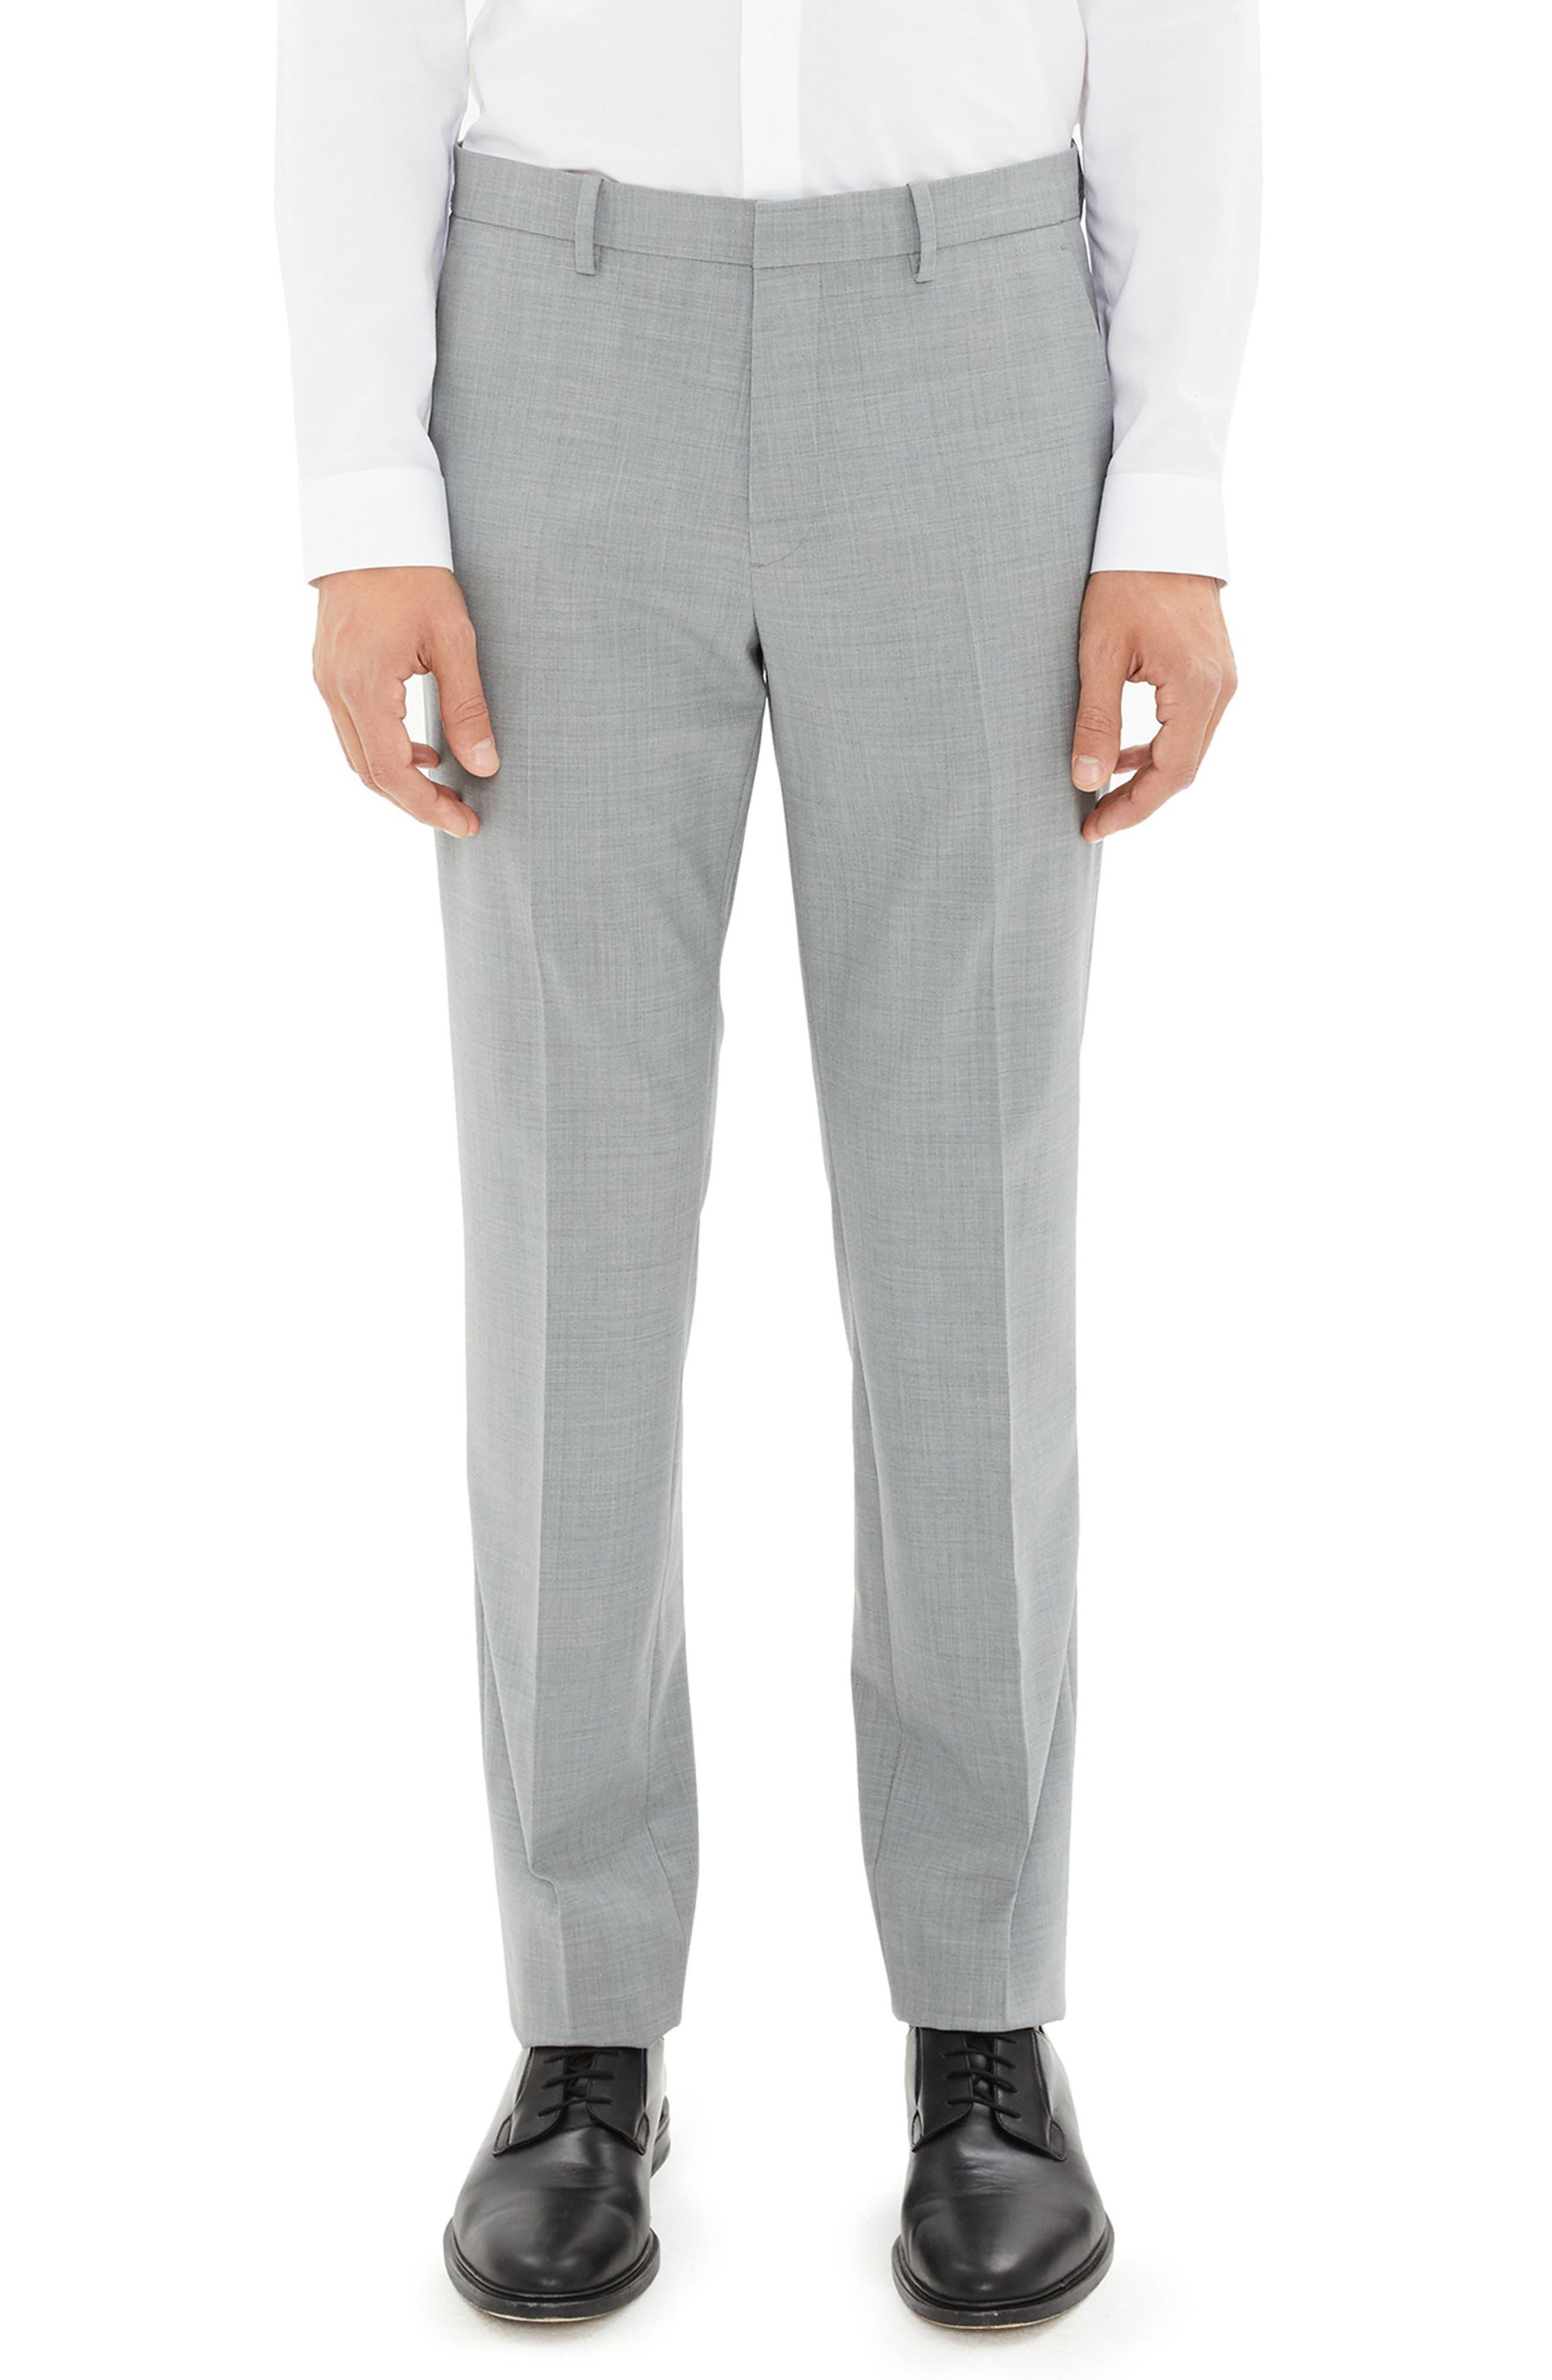 Mayer New Tailor 2 Wool Trousers,                             Main thumbnail 1, color,                             CHROME MELANGE